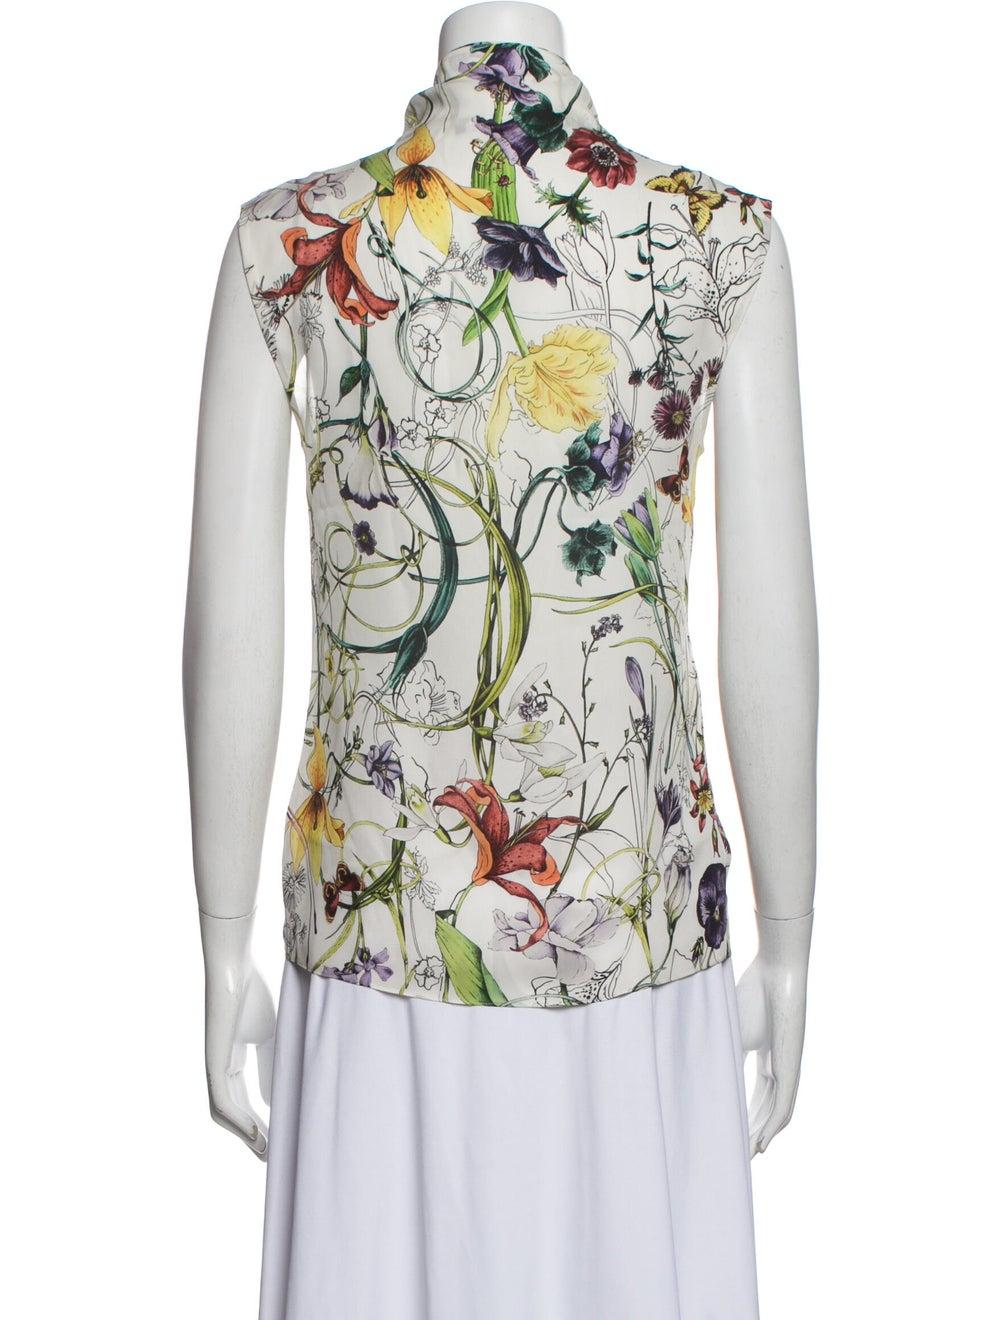 Gucci Silk Floral Print Blouse White - image 3